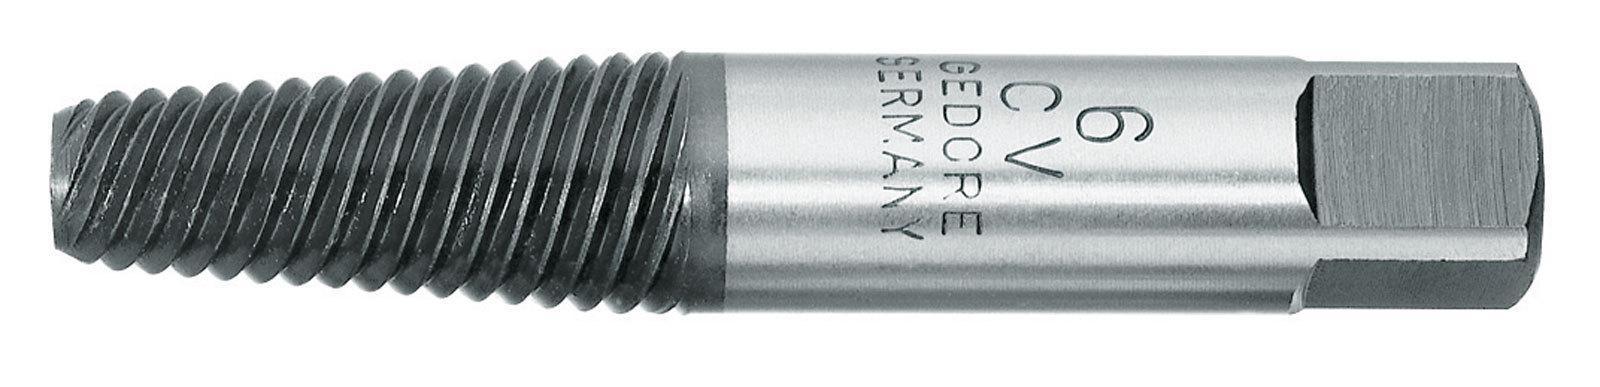 Extractor de tornillos M8-M11 Gedore 8551 3